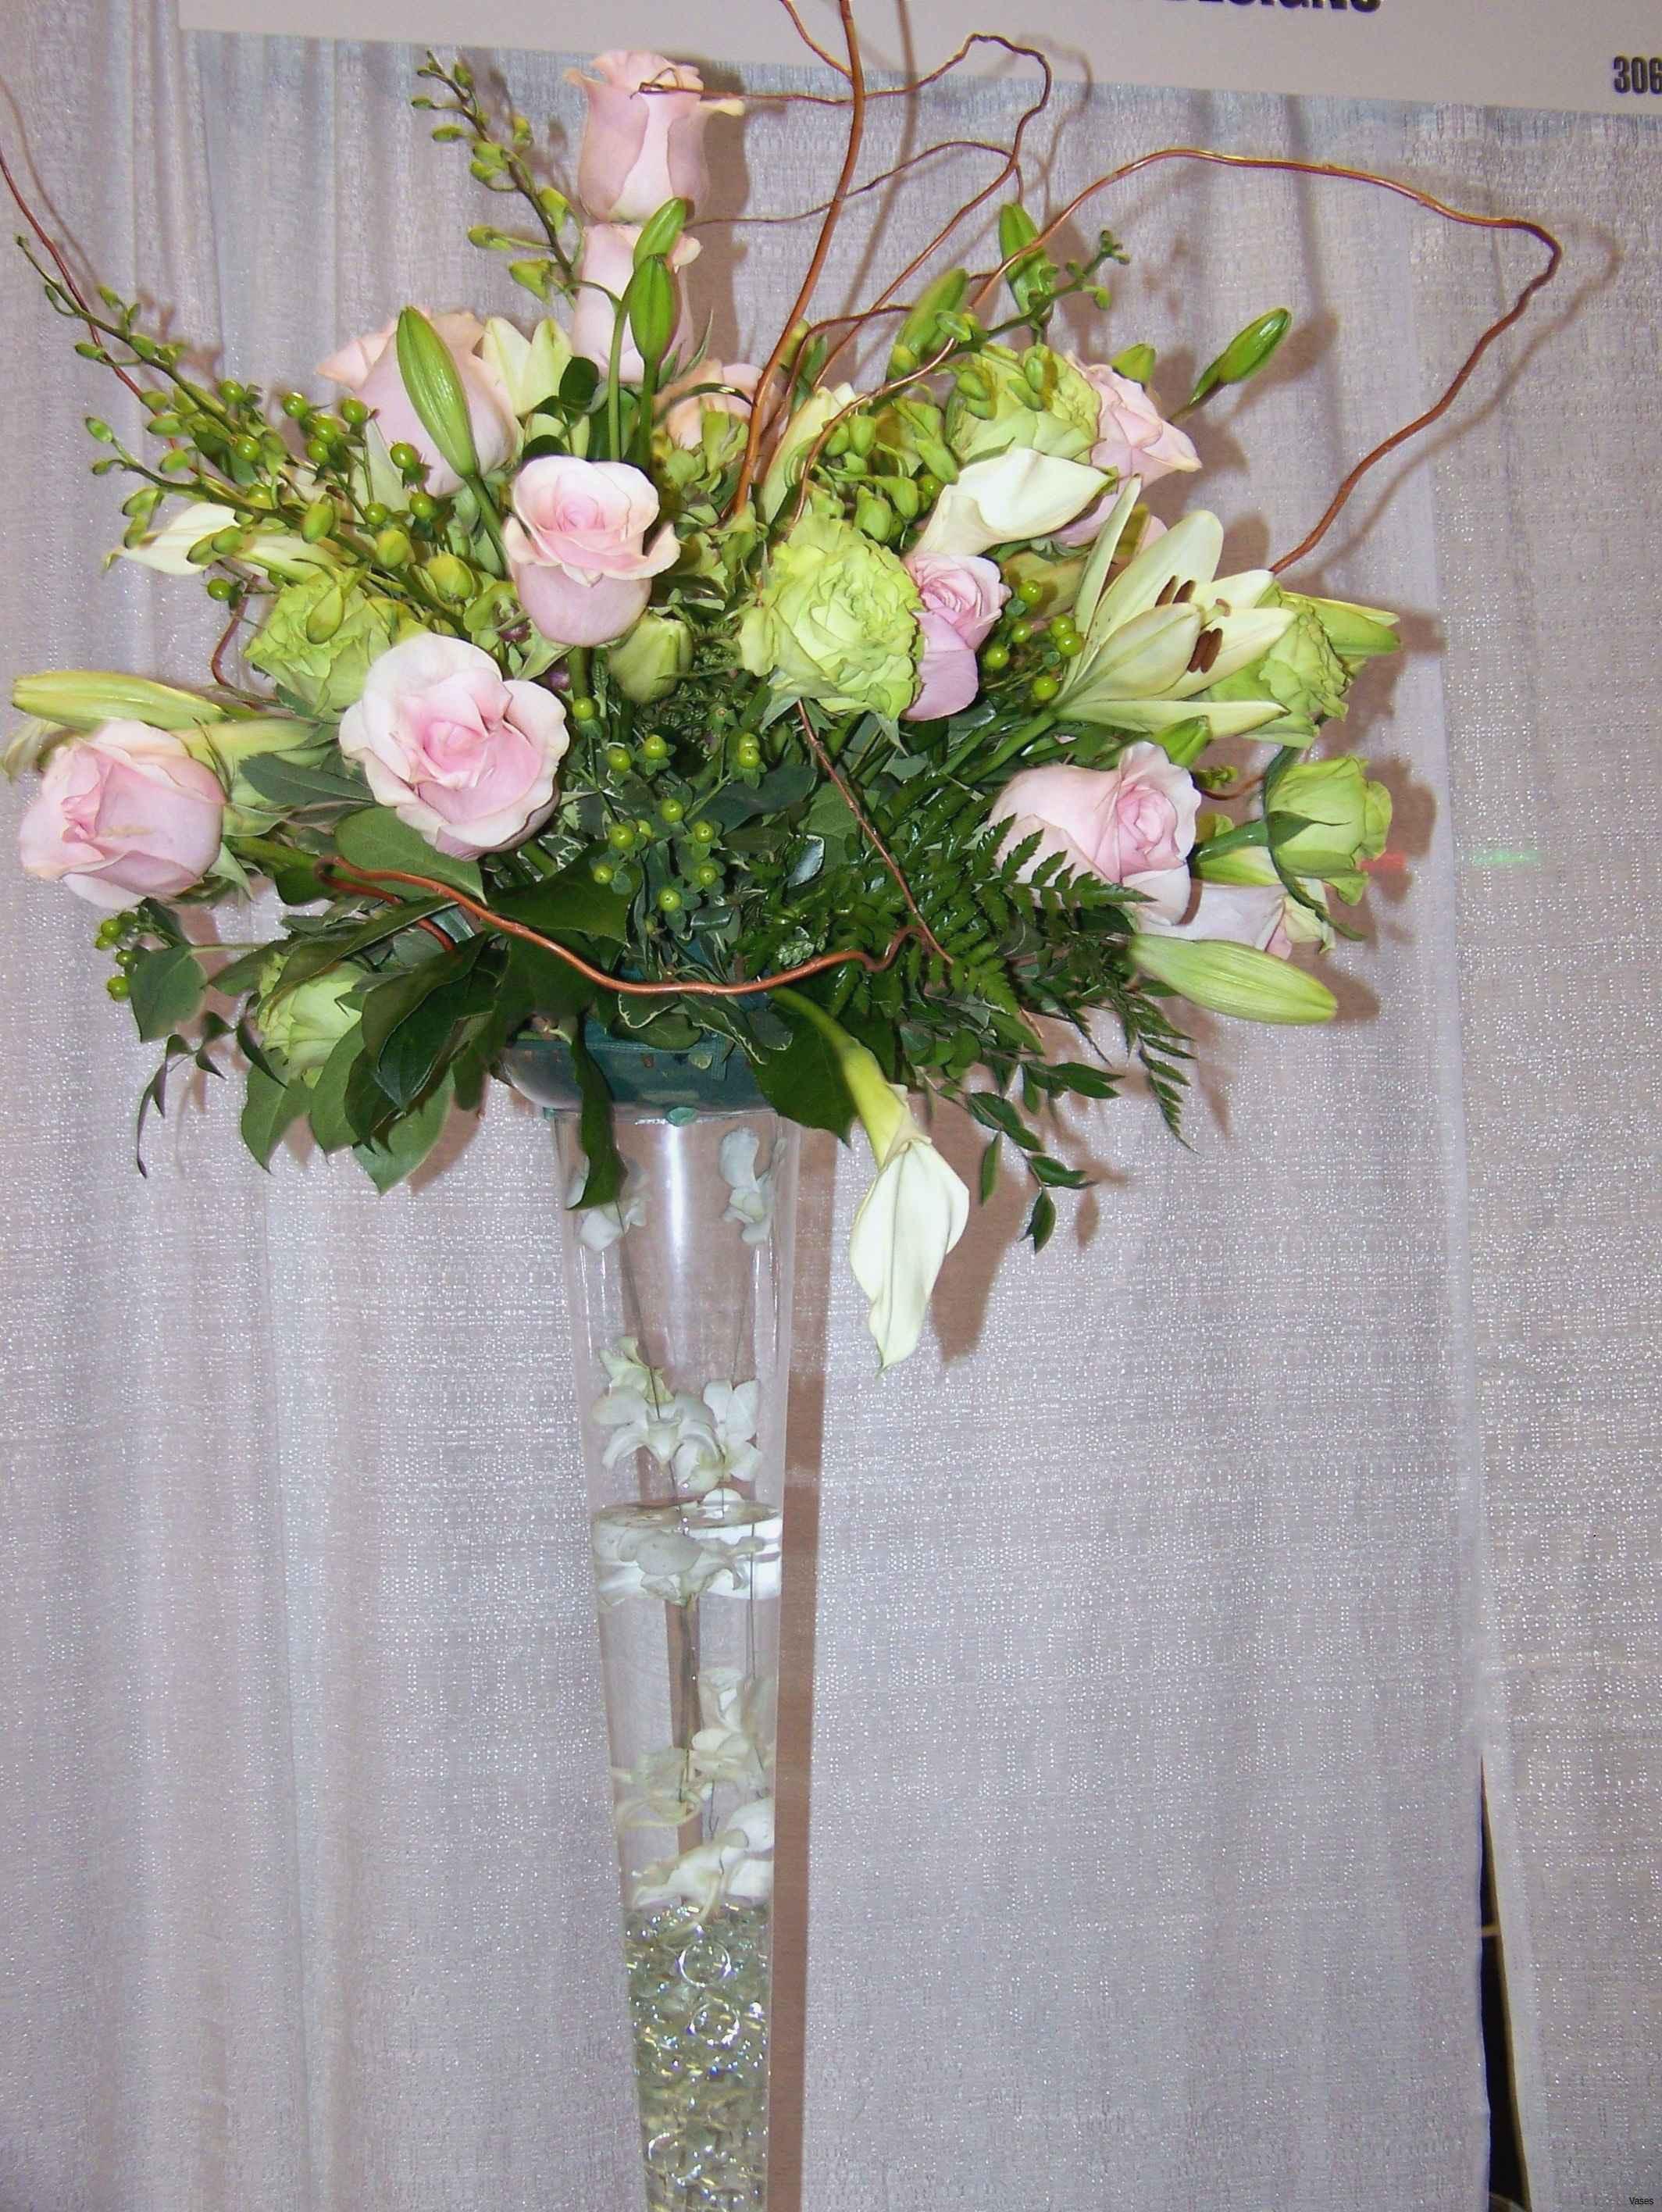 cheap wedding vases in bulk of elegant fall wedding bouquet wedding theme inside h vases ideas for floral arrangements in i 0d design ideas design inspiration rustic fall